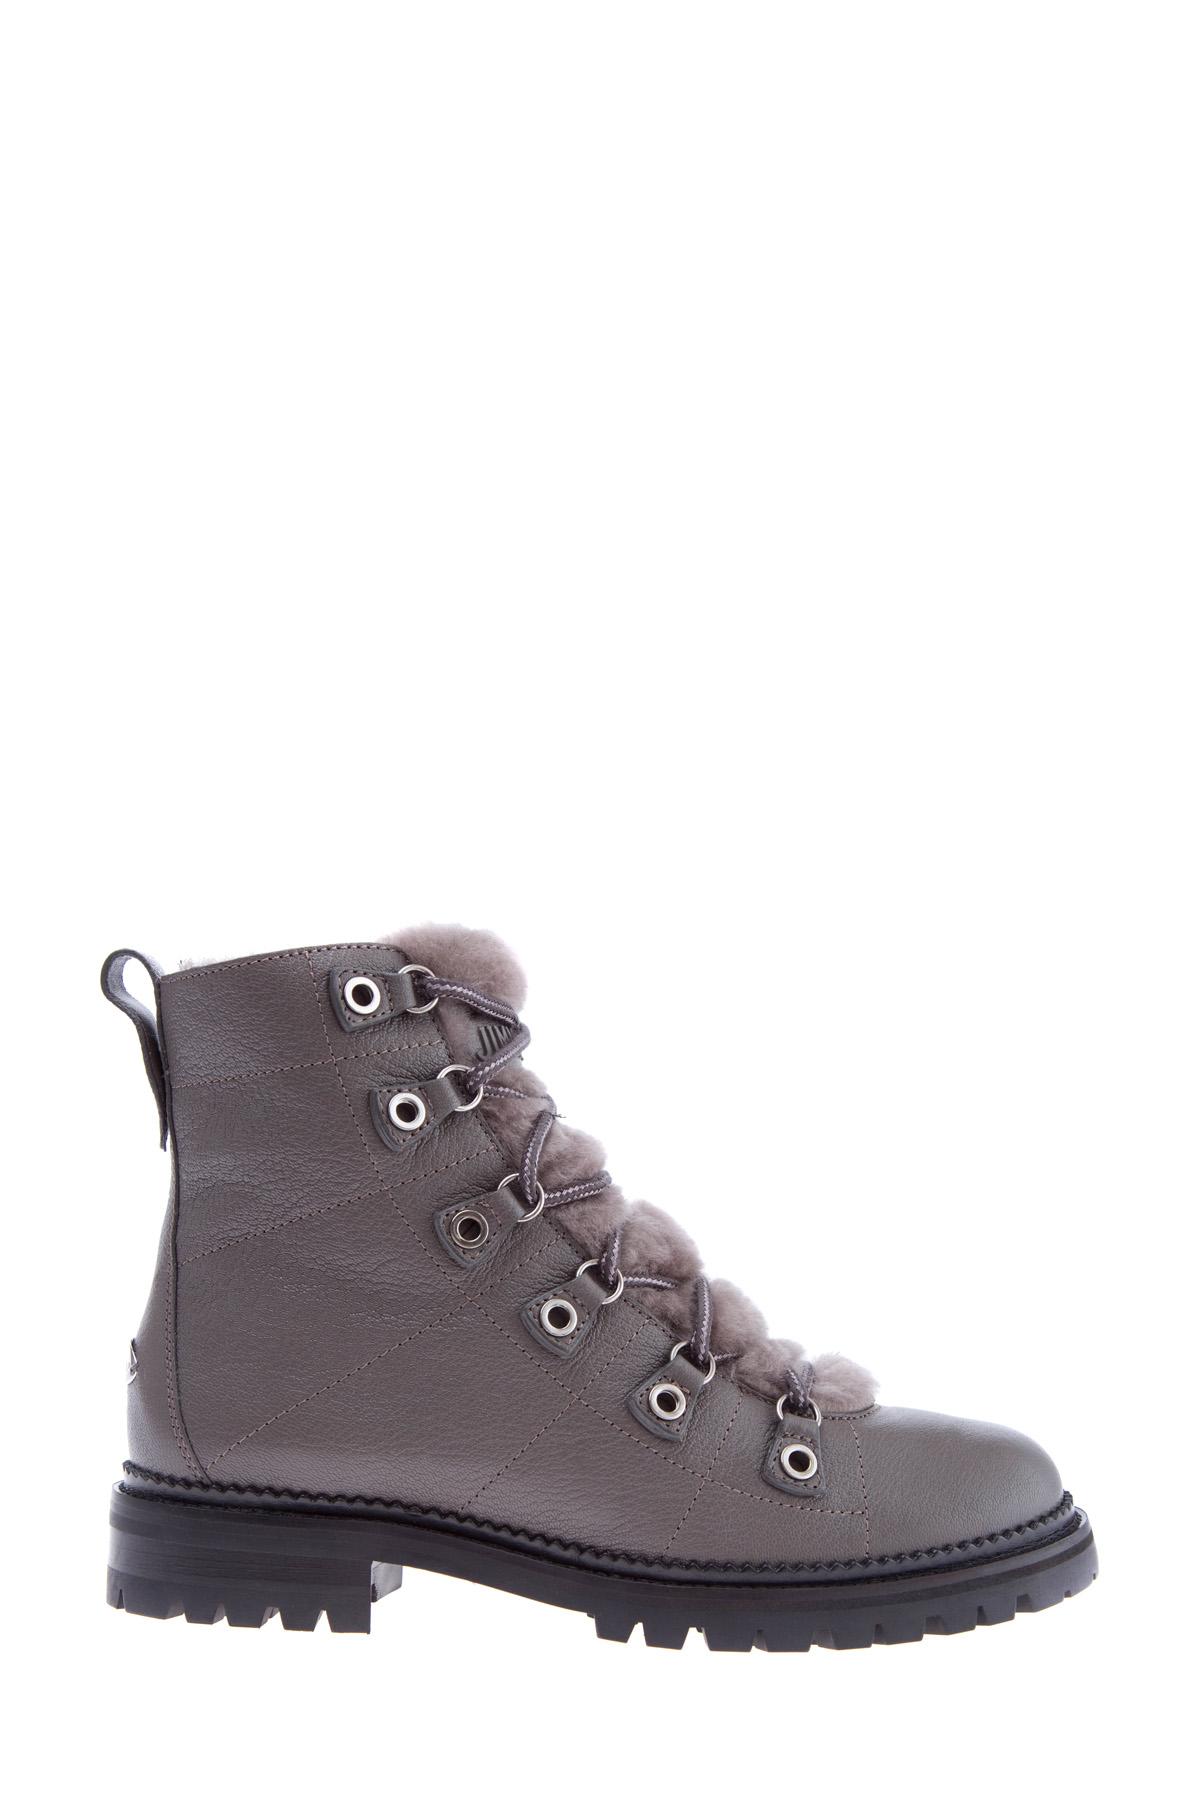 Купить Ботинки, JIMMY CHOO, Италия, кожа 100%, мех 100%